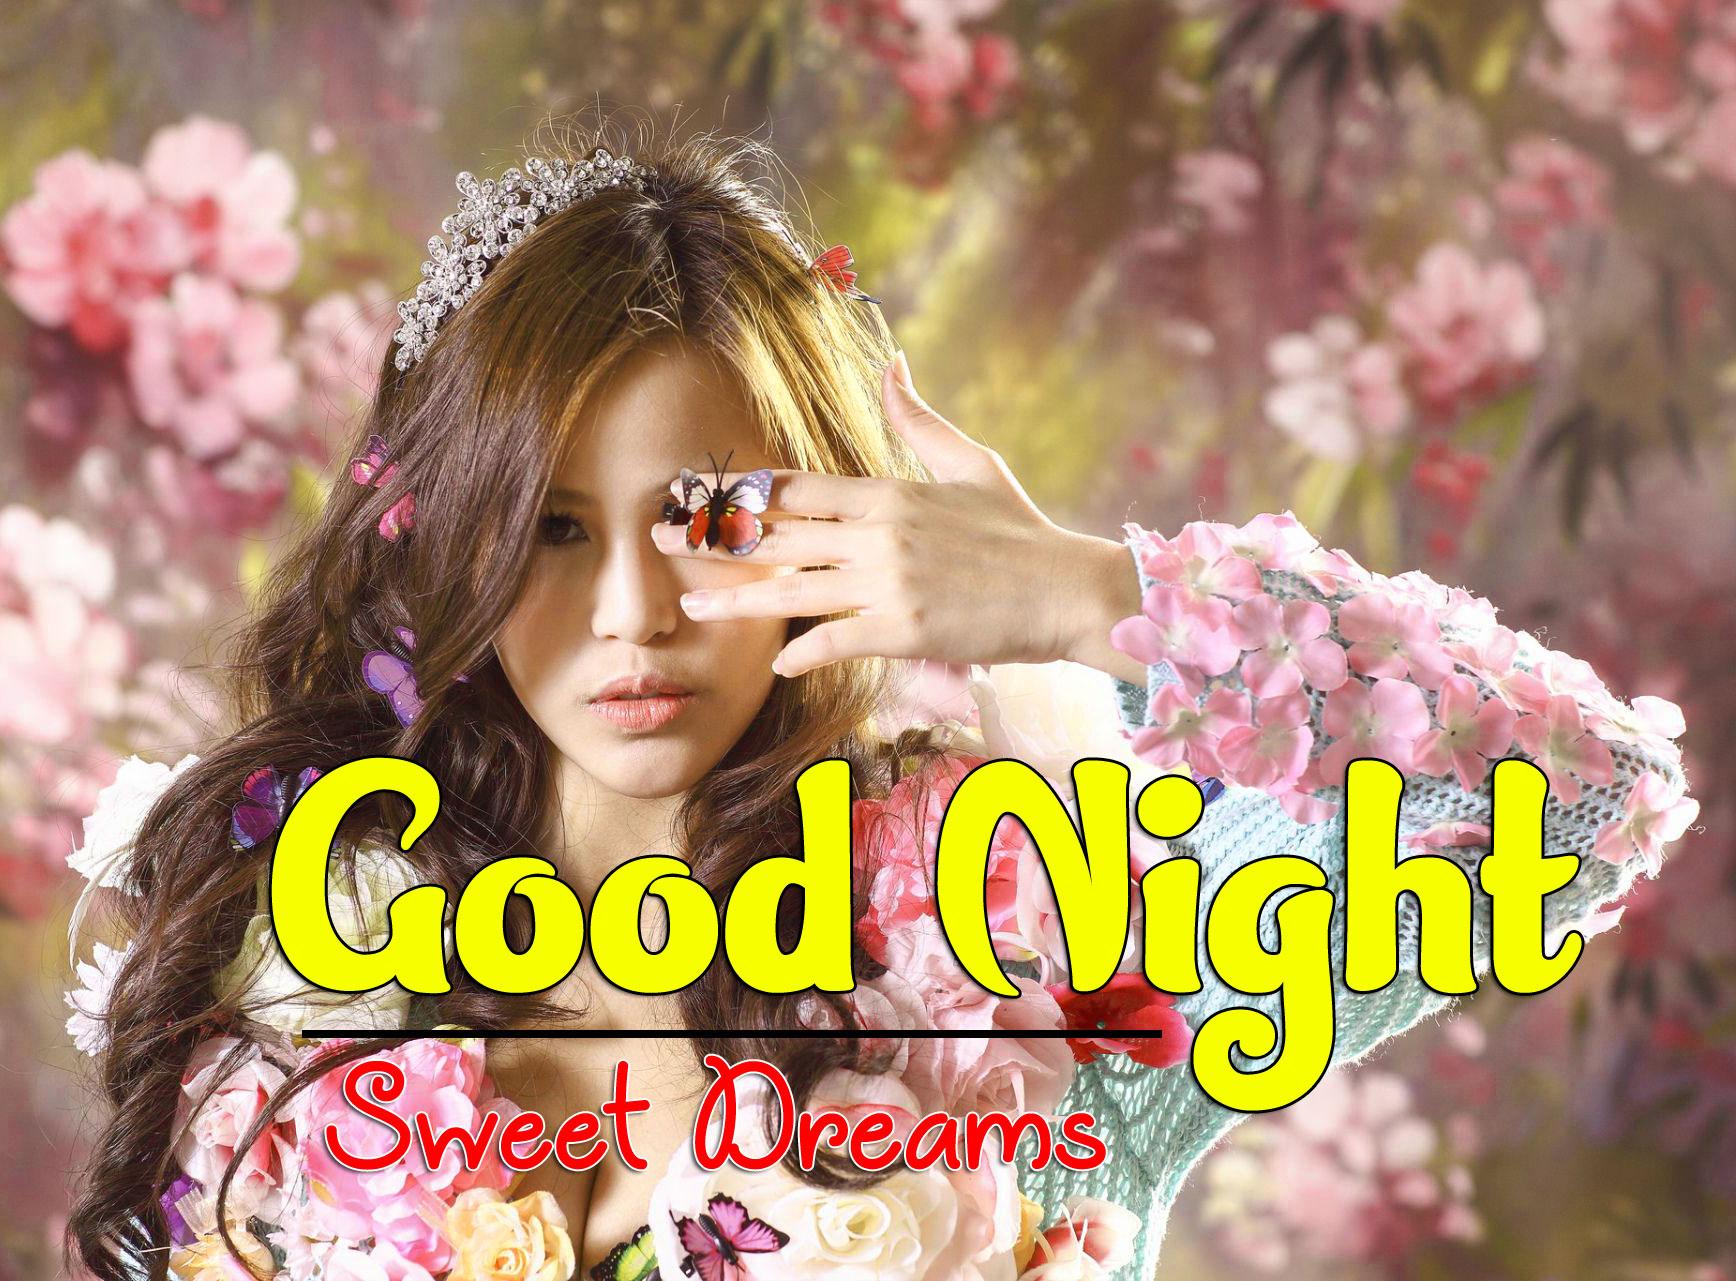 HD Good Night Photo Images